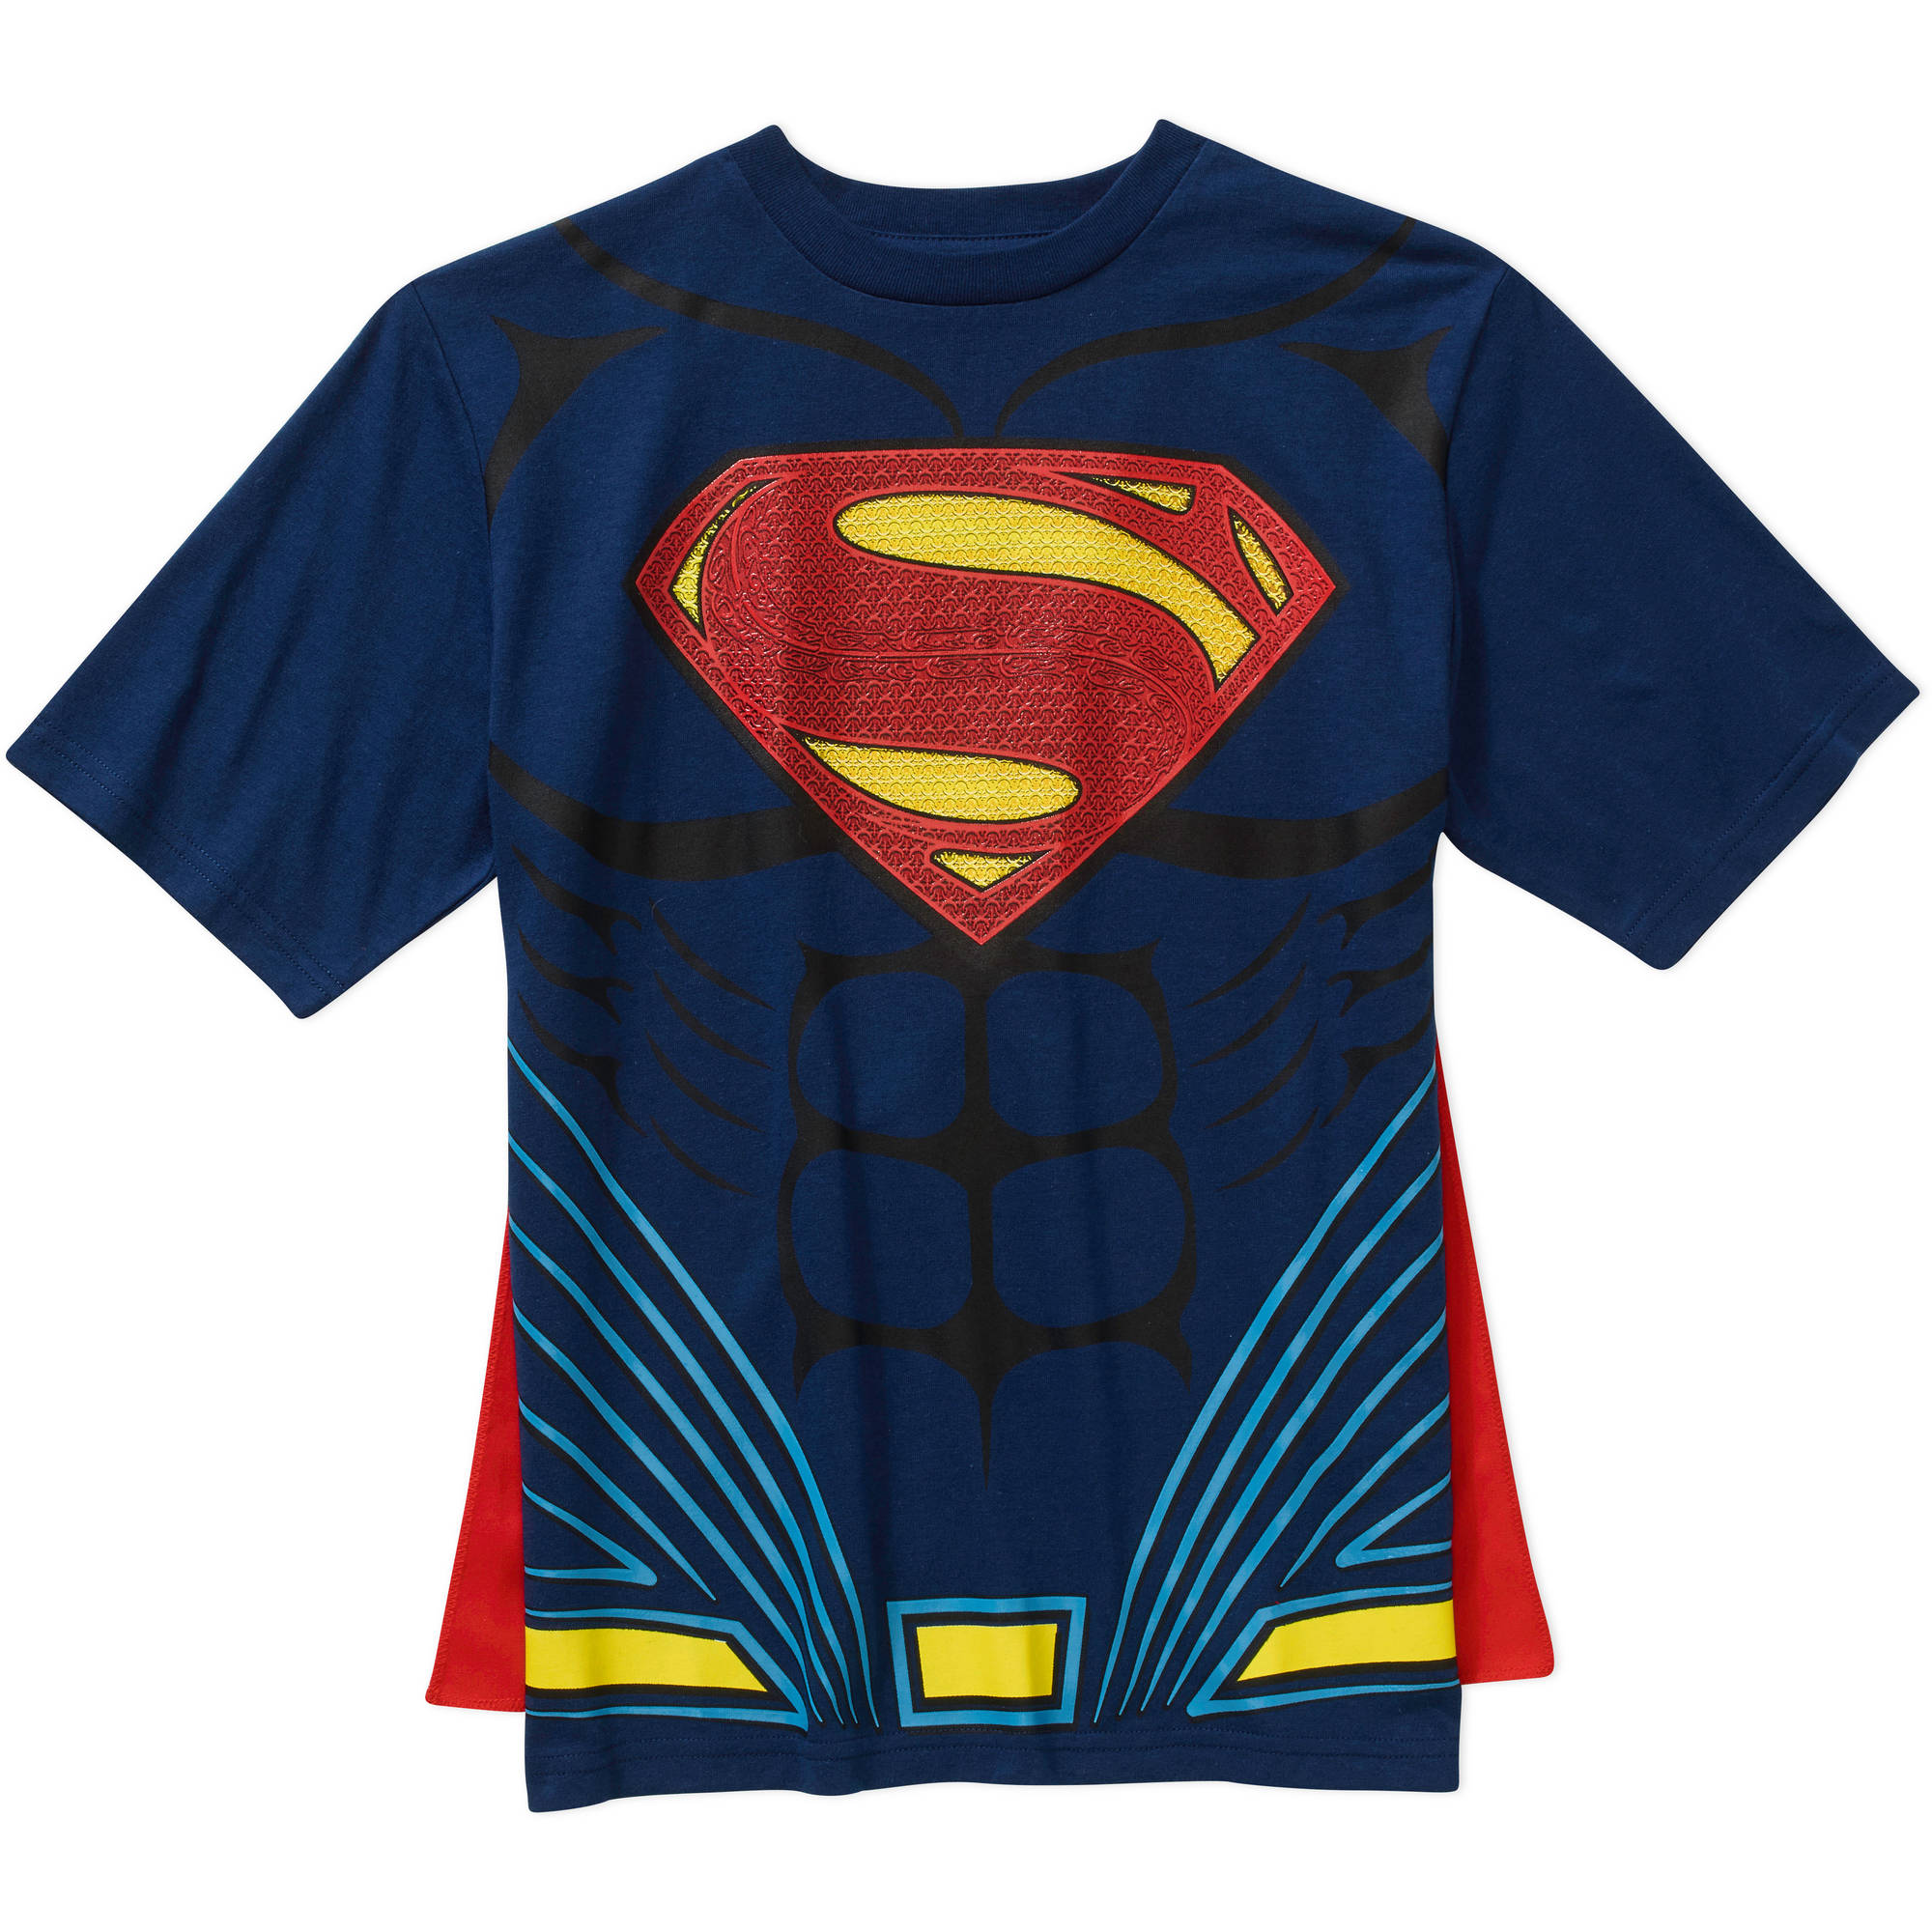 DC Comics Superman Boys Short Sleeve Cape Graphic Tee